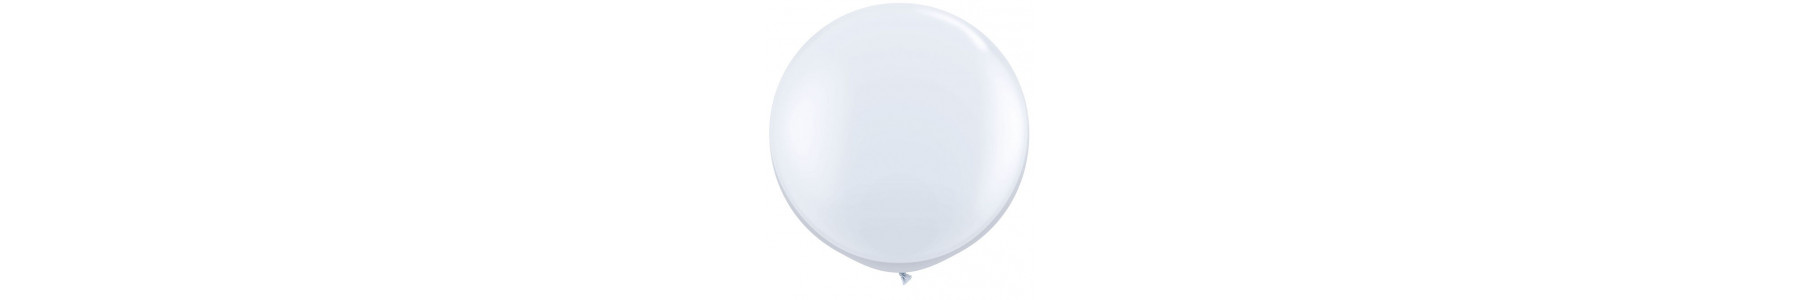 Baloane mini jumbo 40 cm